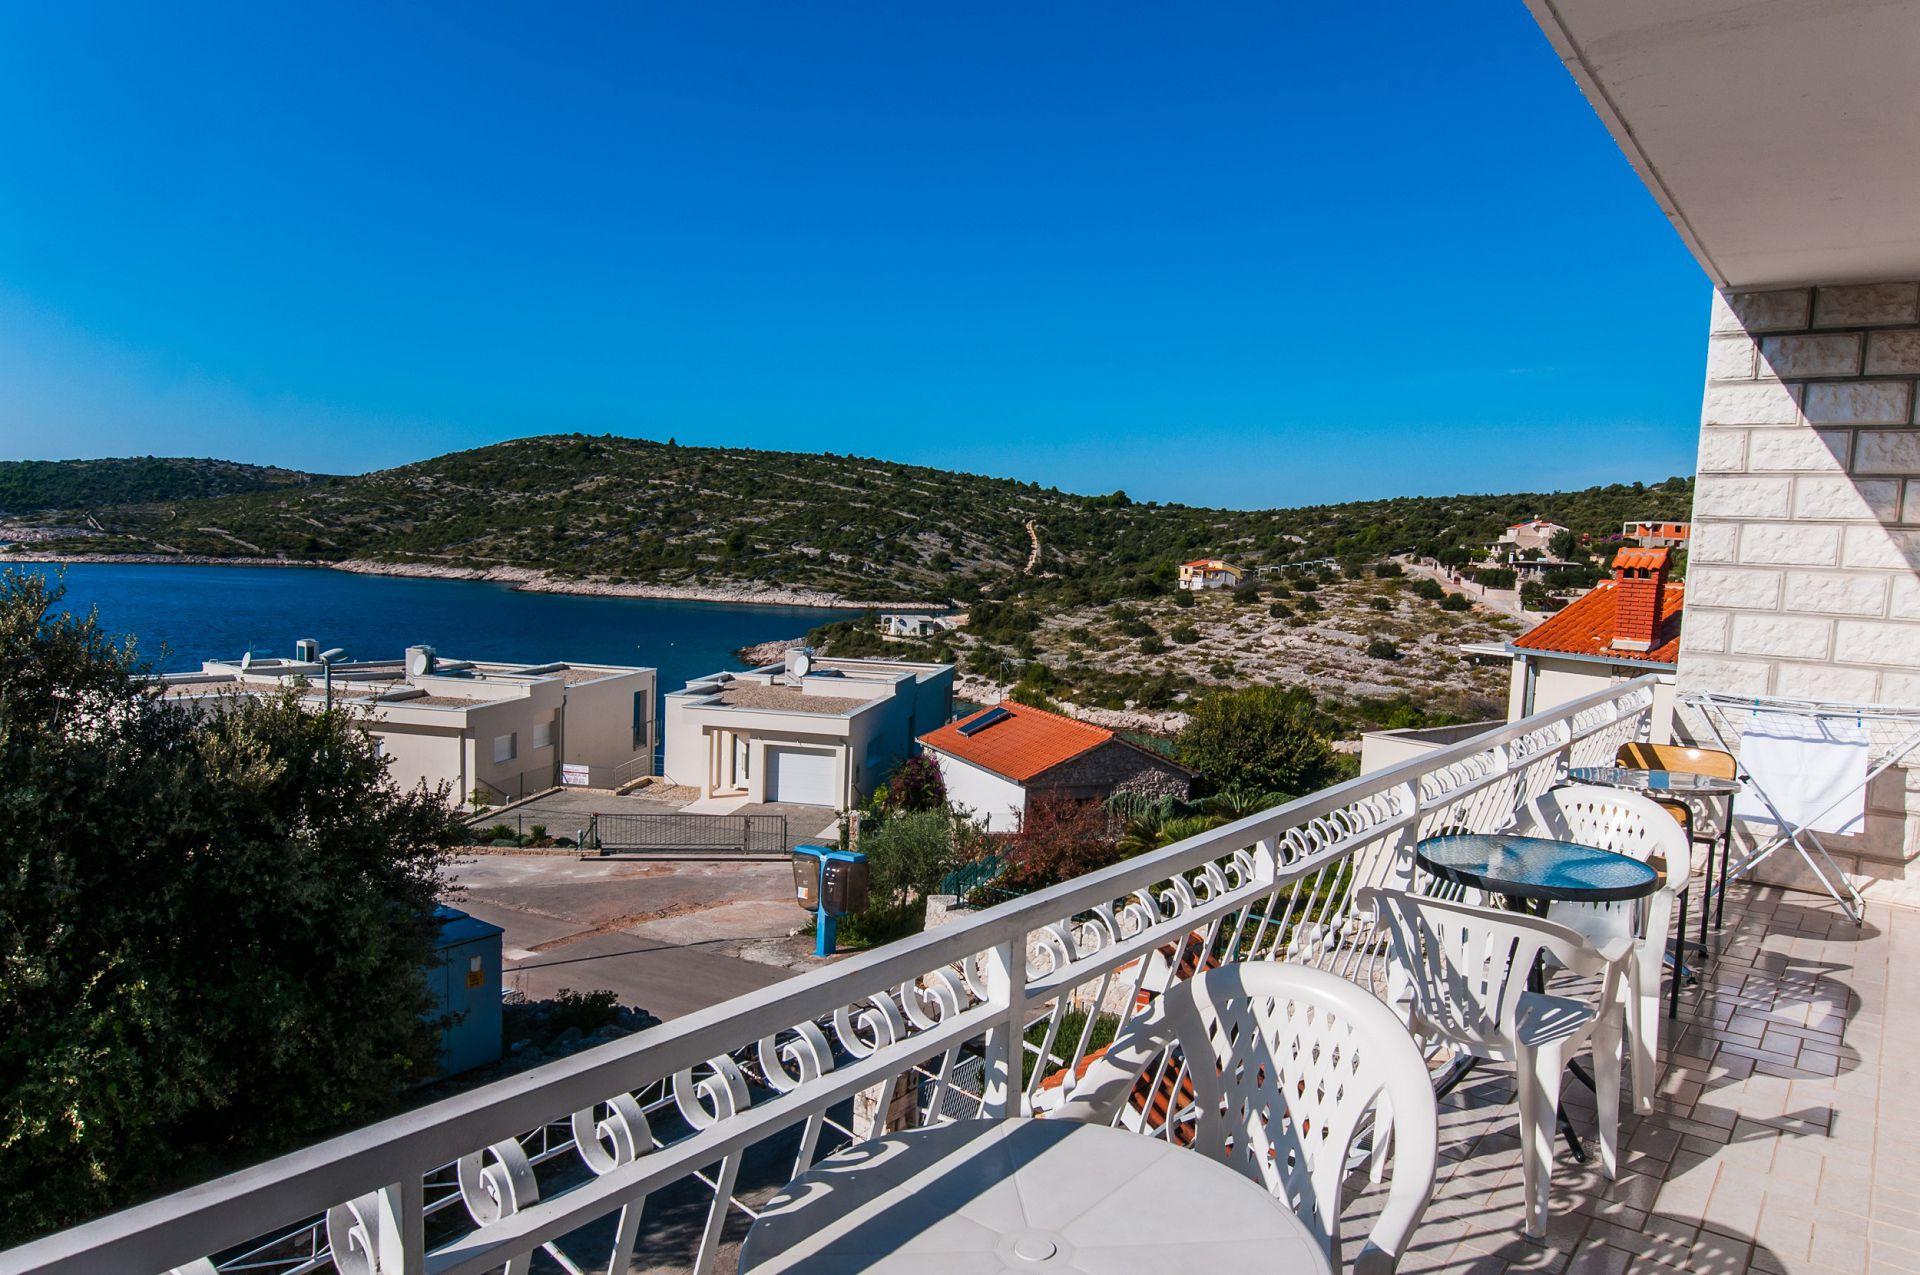 Ferienwohnung 01106ROGO A2(6+2) - Bucht Kanica (Rogoznica) (741933), Rogoznica, , Dalmatien, Kroatien, Bild 11